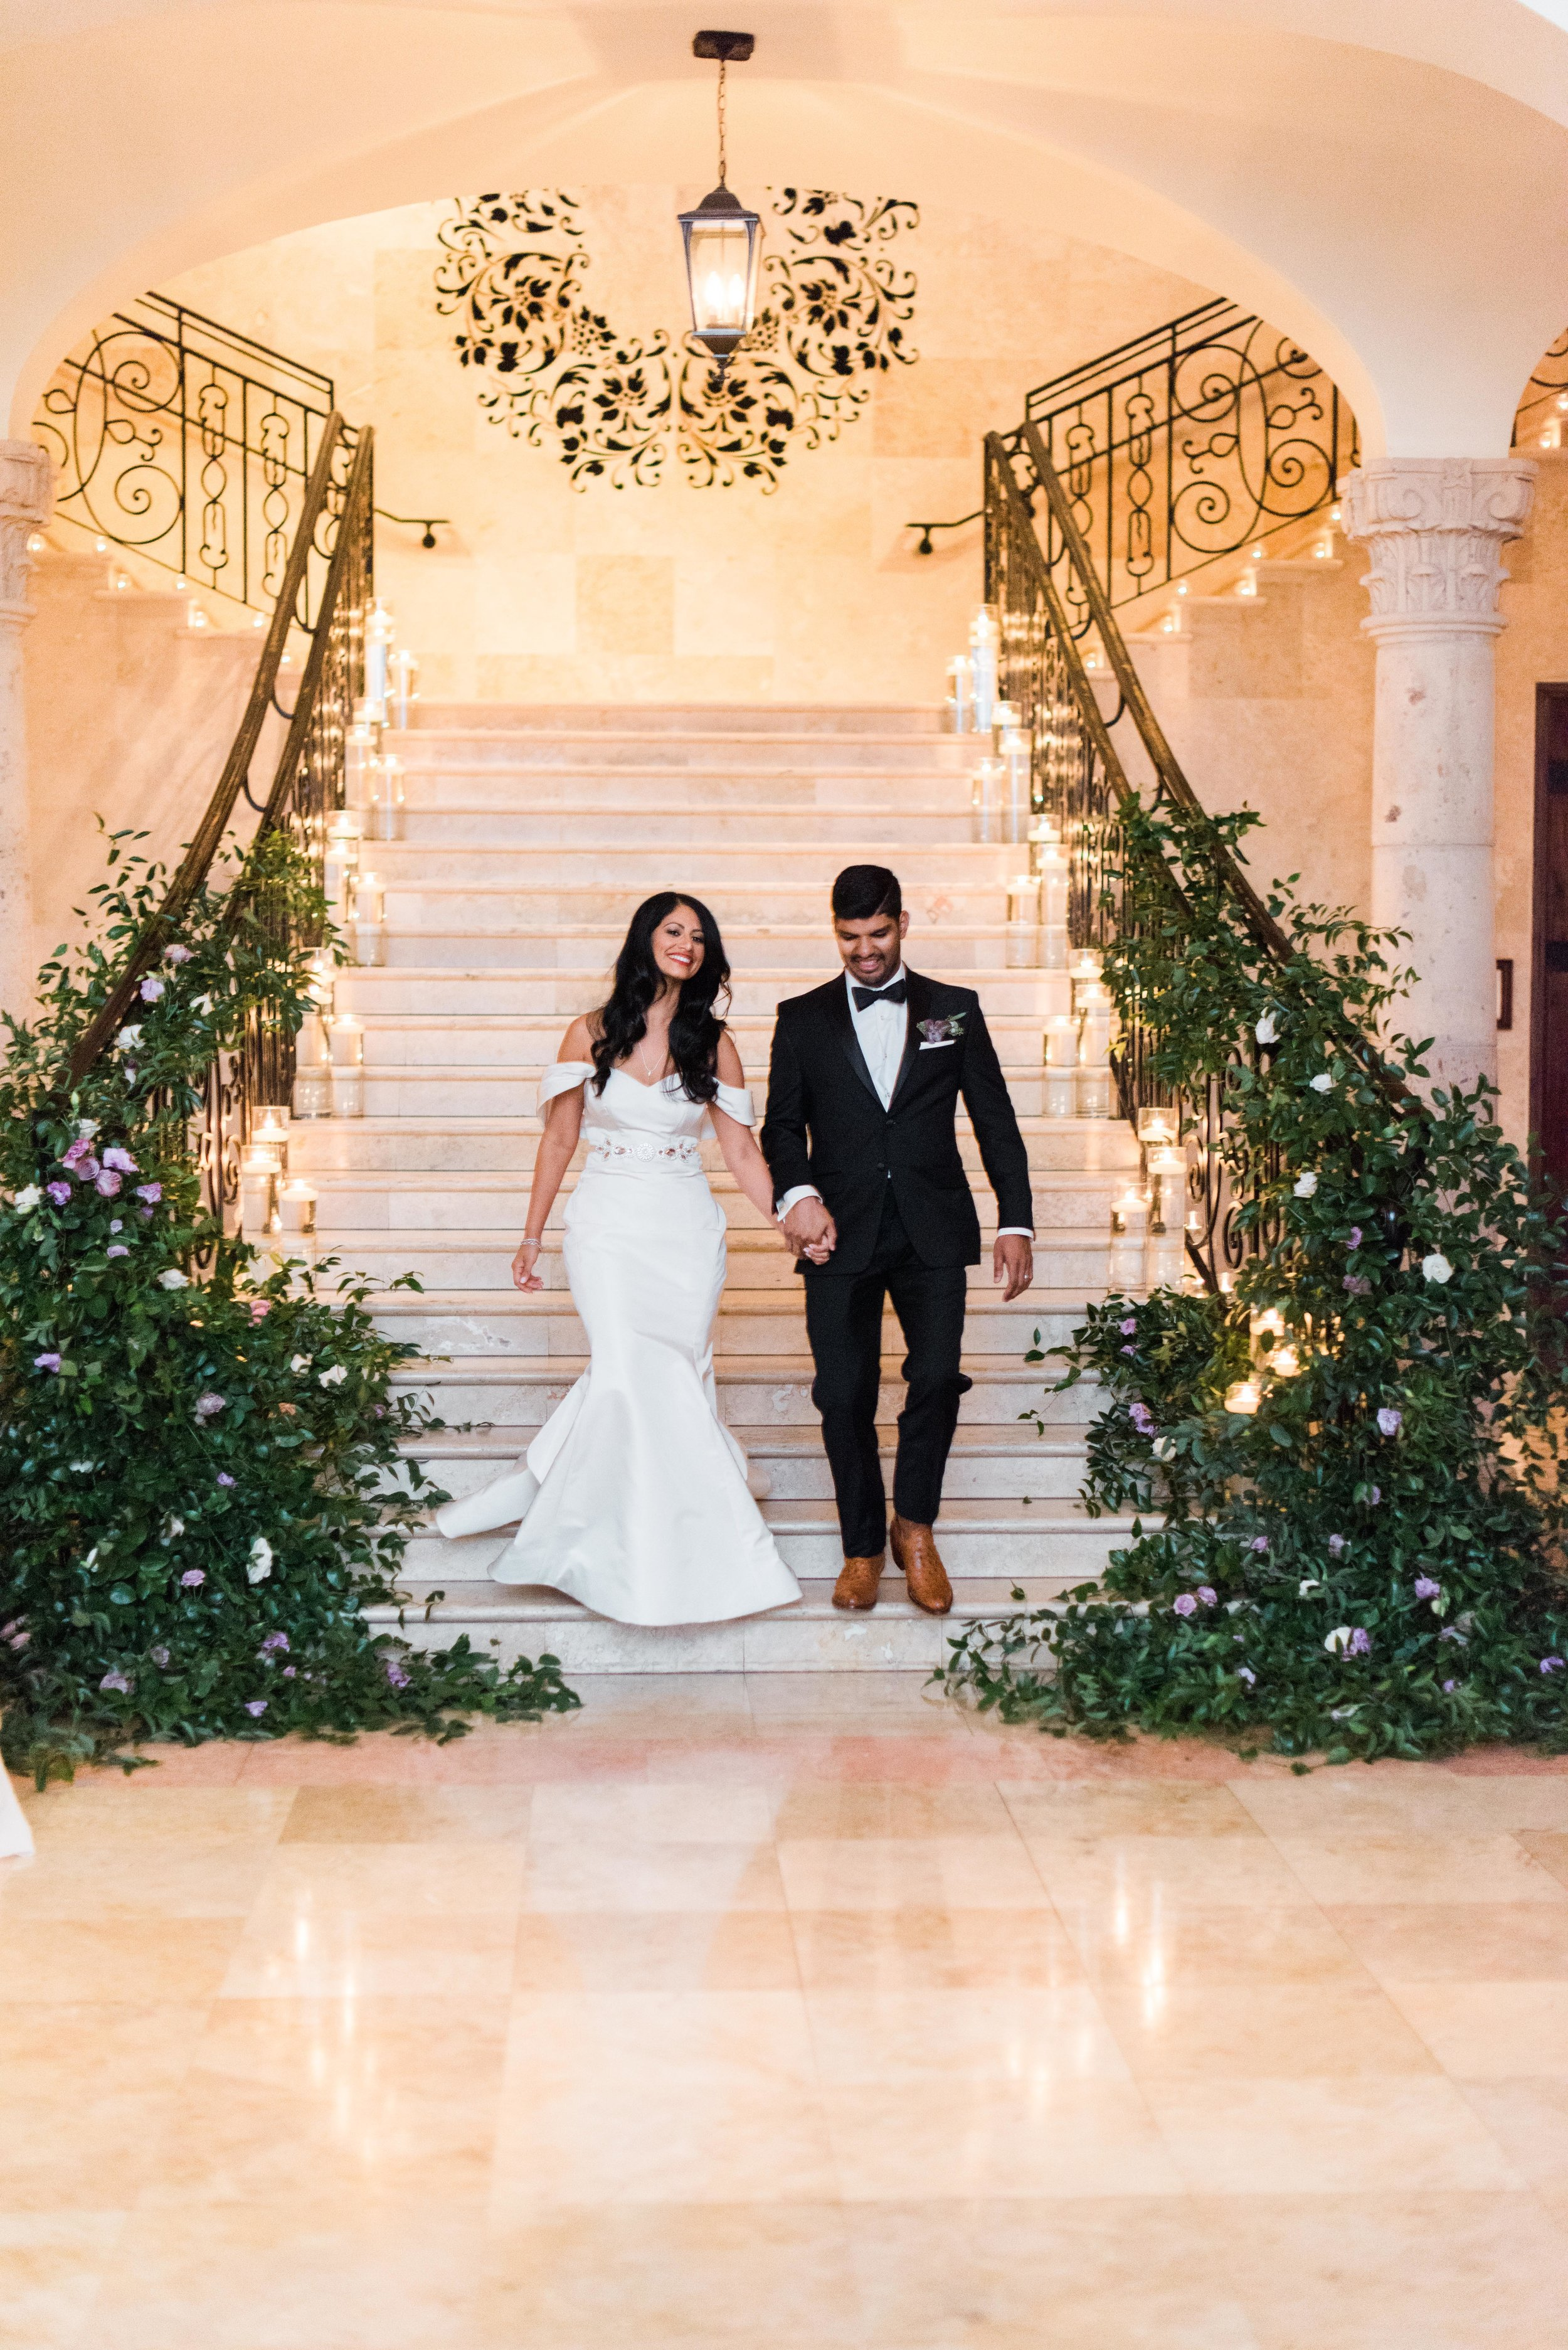 Fine-Art-Film-Houston-Wedding-Photographer-Best-Top-Luxury-Texas-Austin-Dallas-Destination-Dana-Fernandez-Photography-The-Bell-Tower-on-34th-Indian-31.jpg